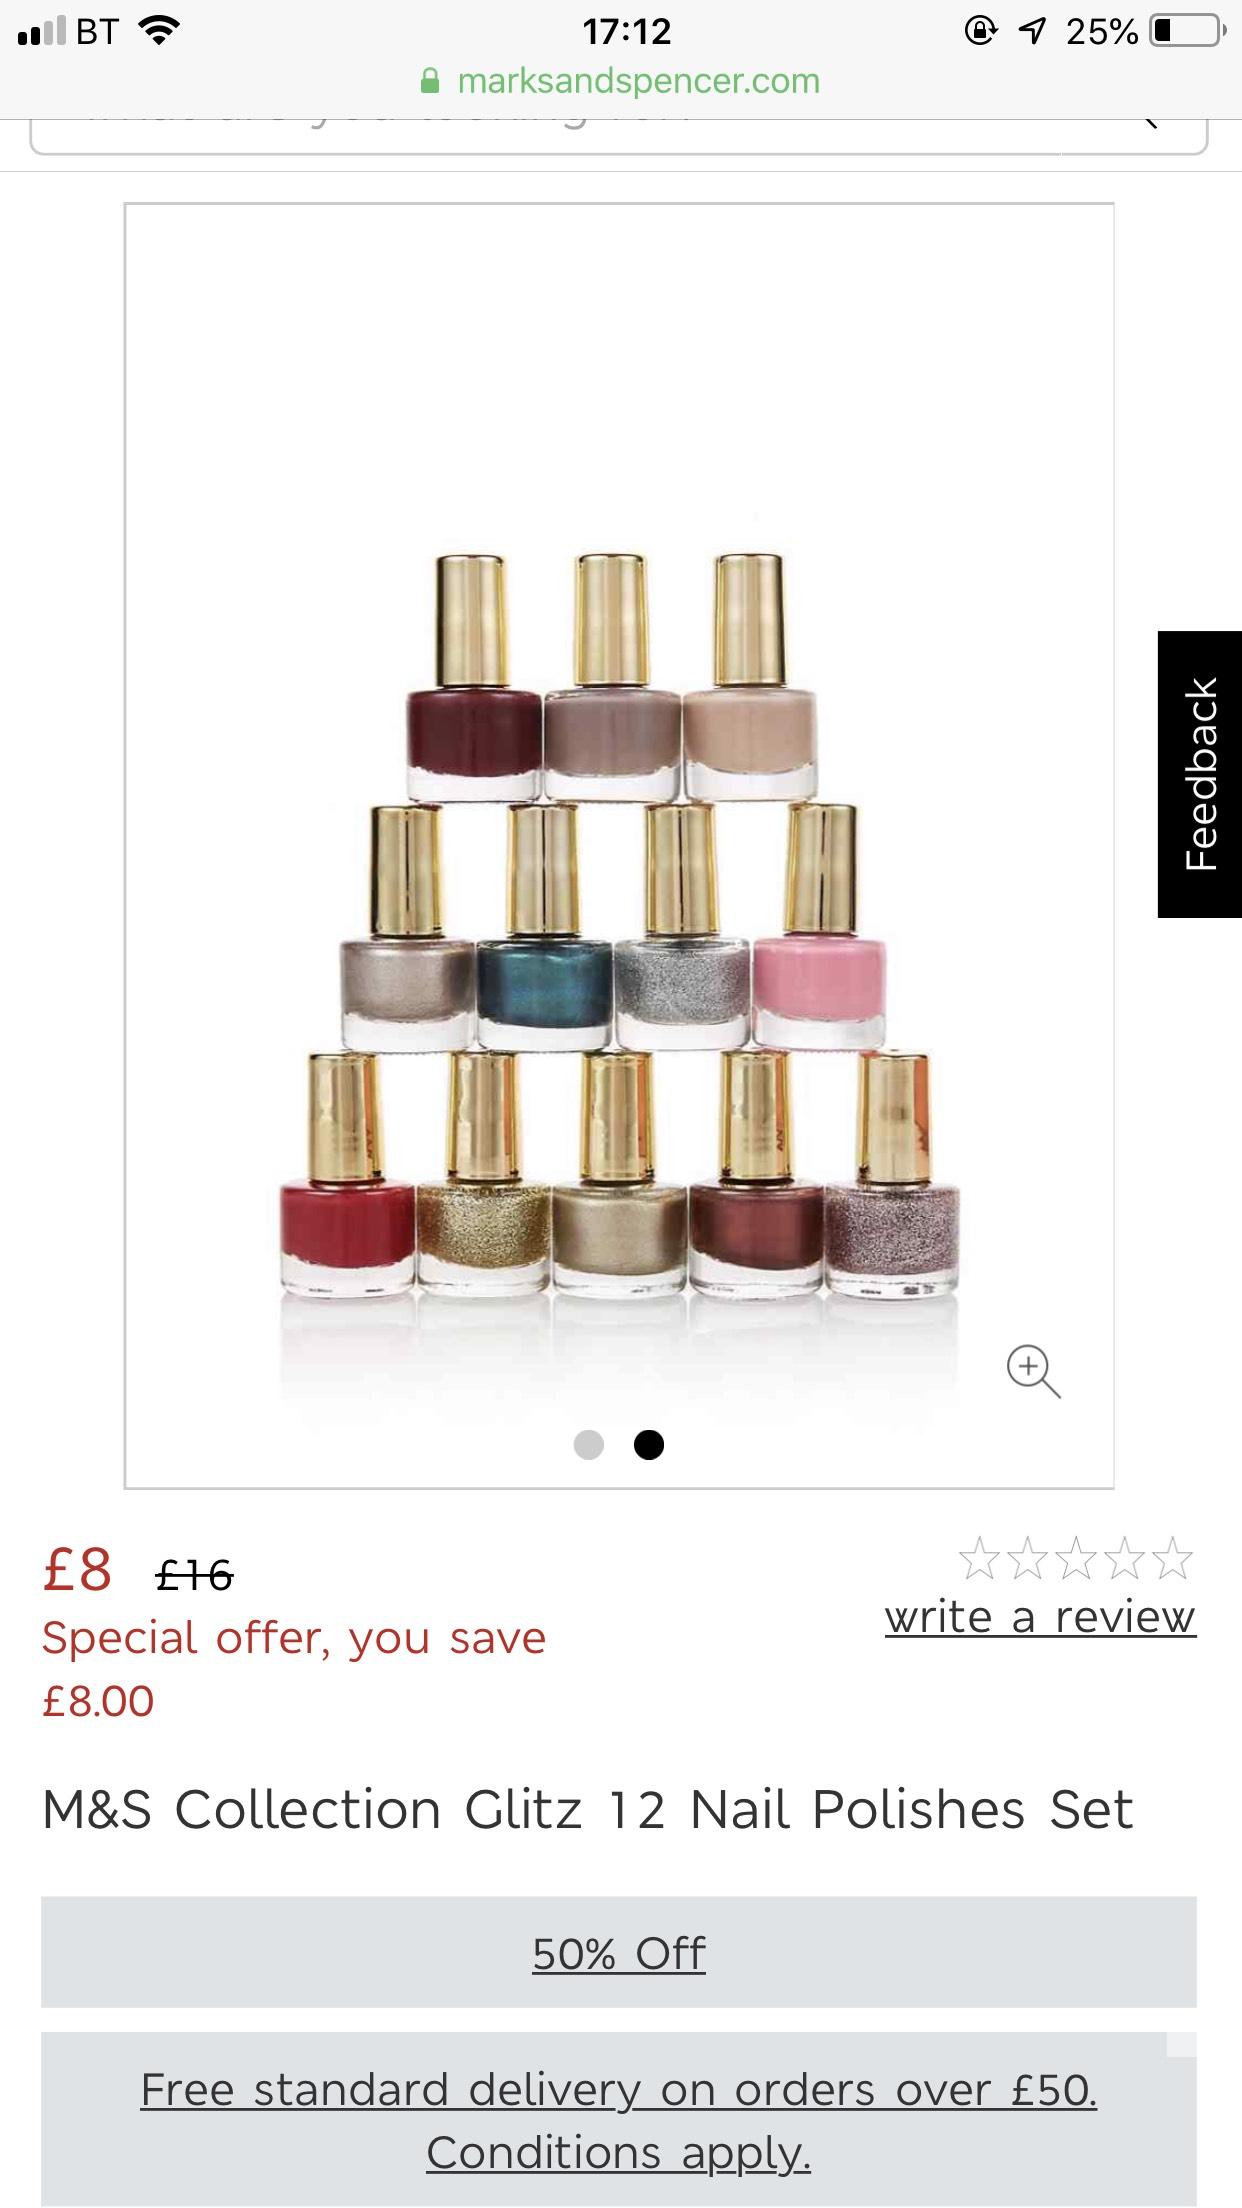 M&S COLLECTION  Glitz 12 Nail Polishes Set £8 - Free c&c